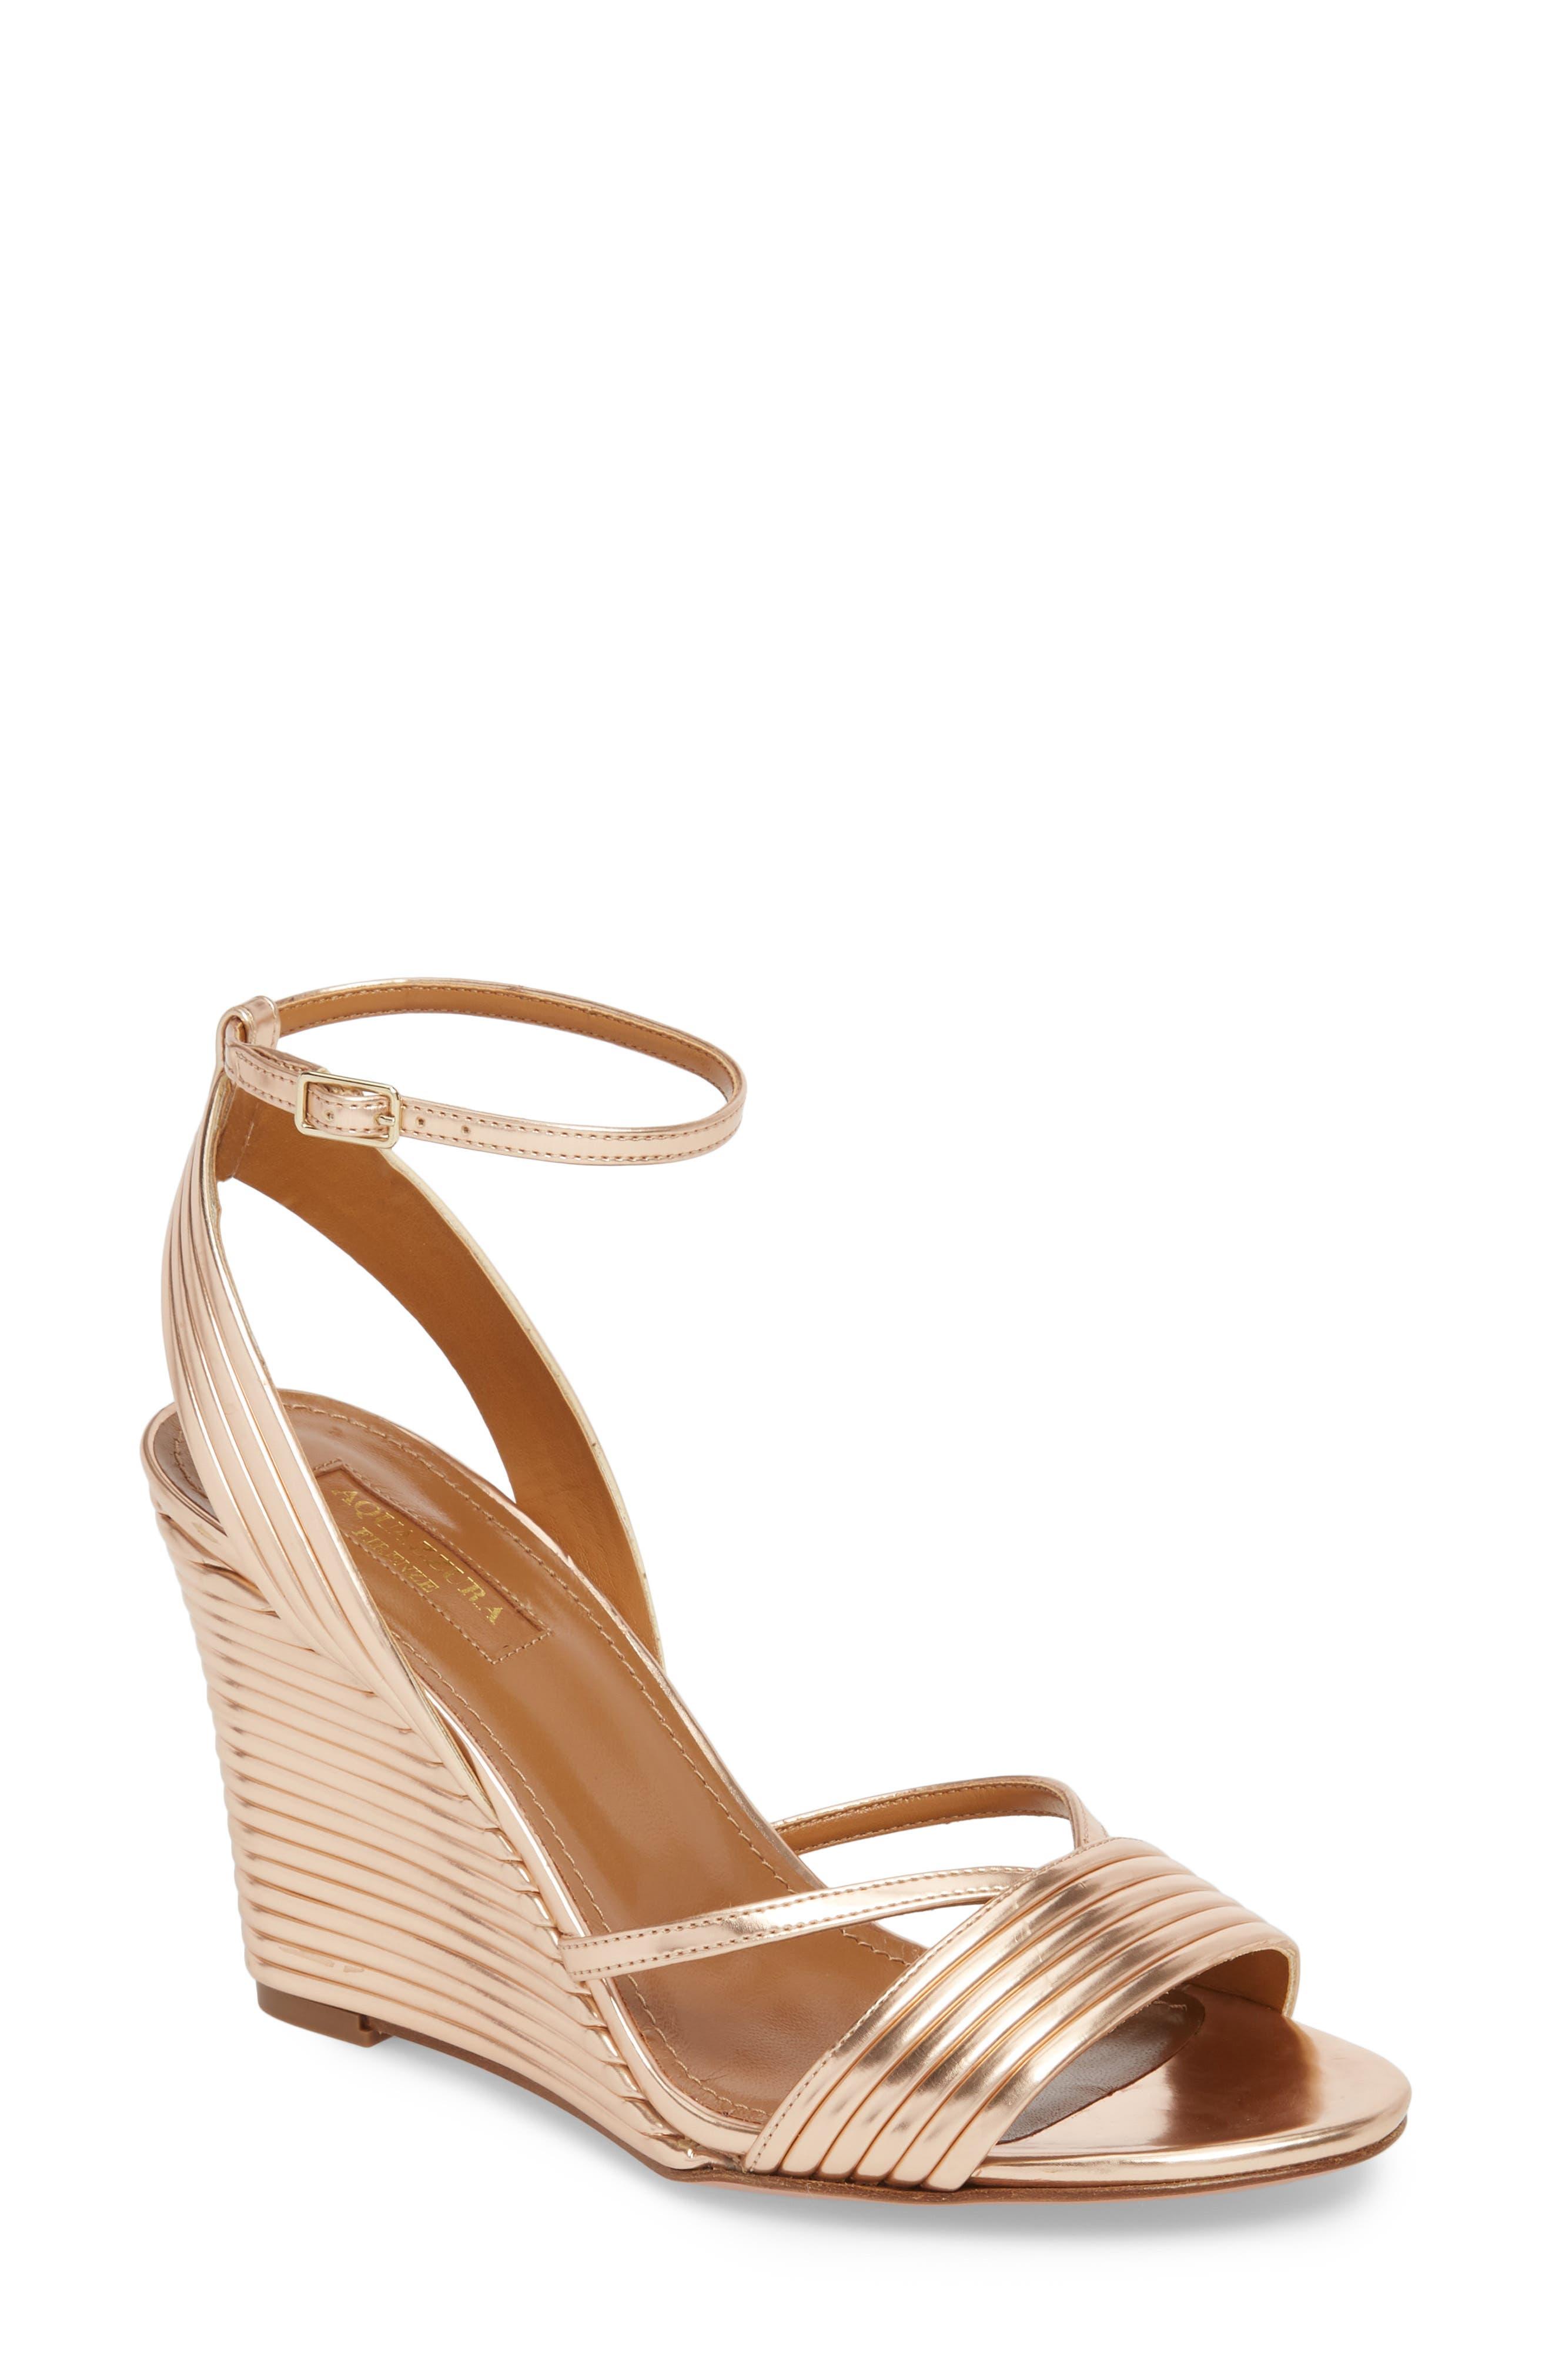 Sundance Wedge Sandal,                         Main,                         color, Cipria